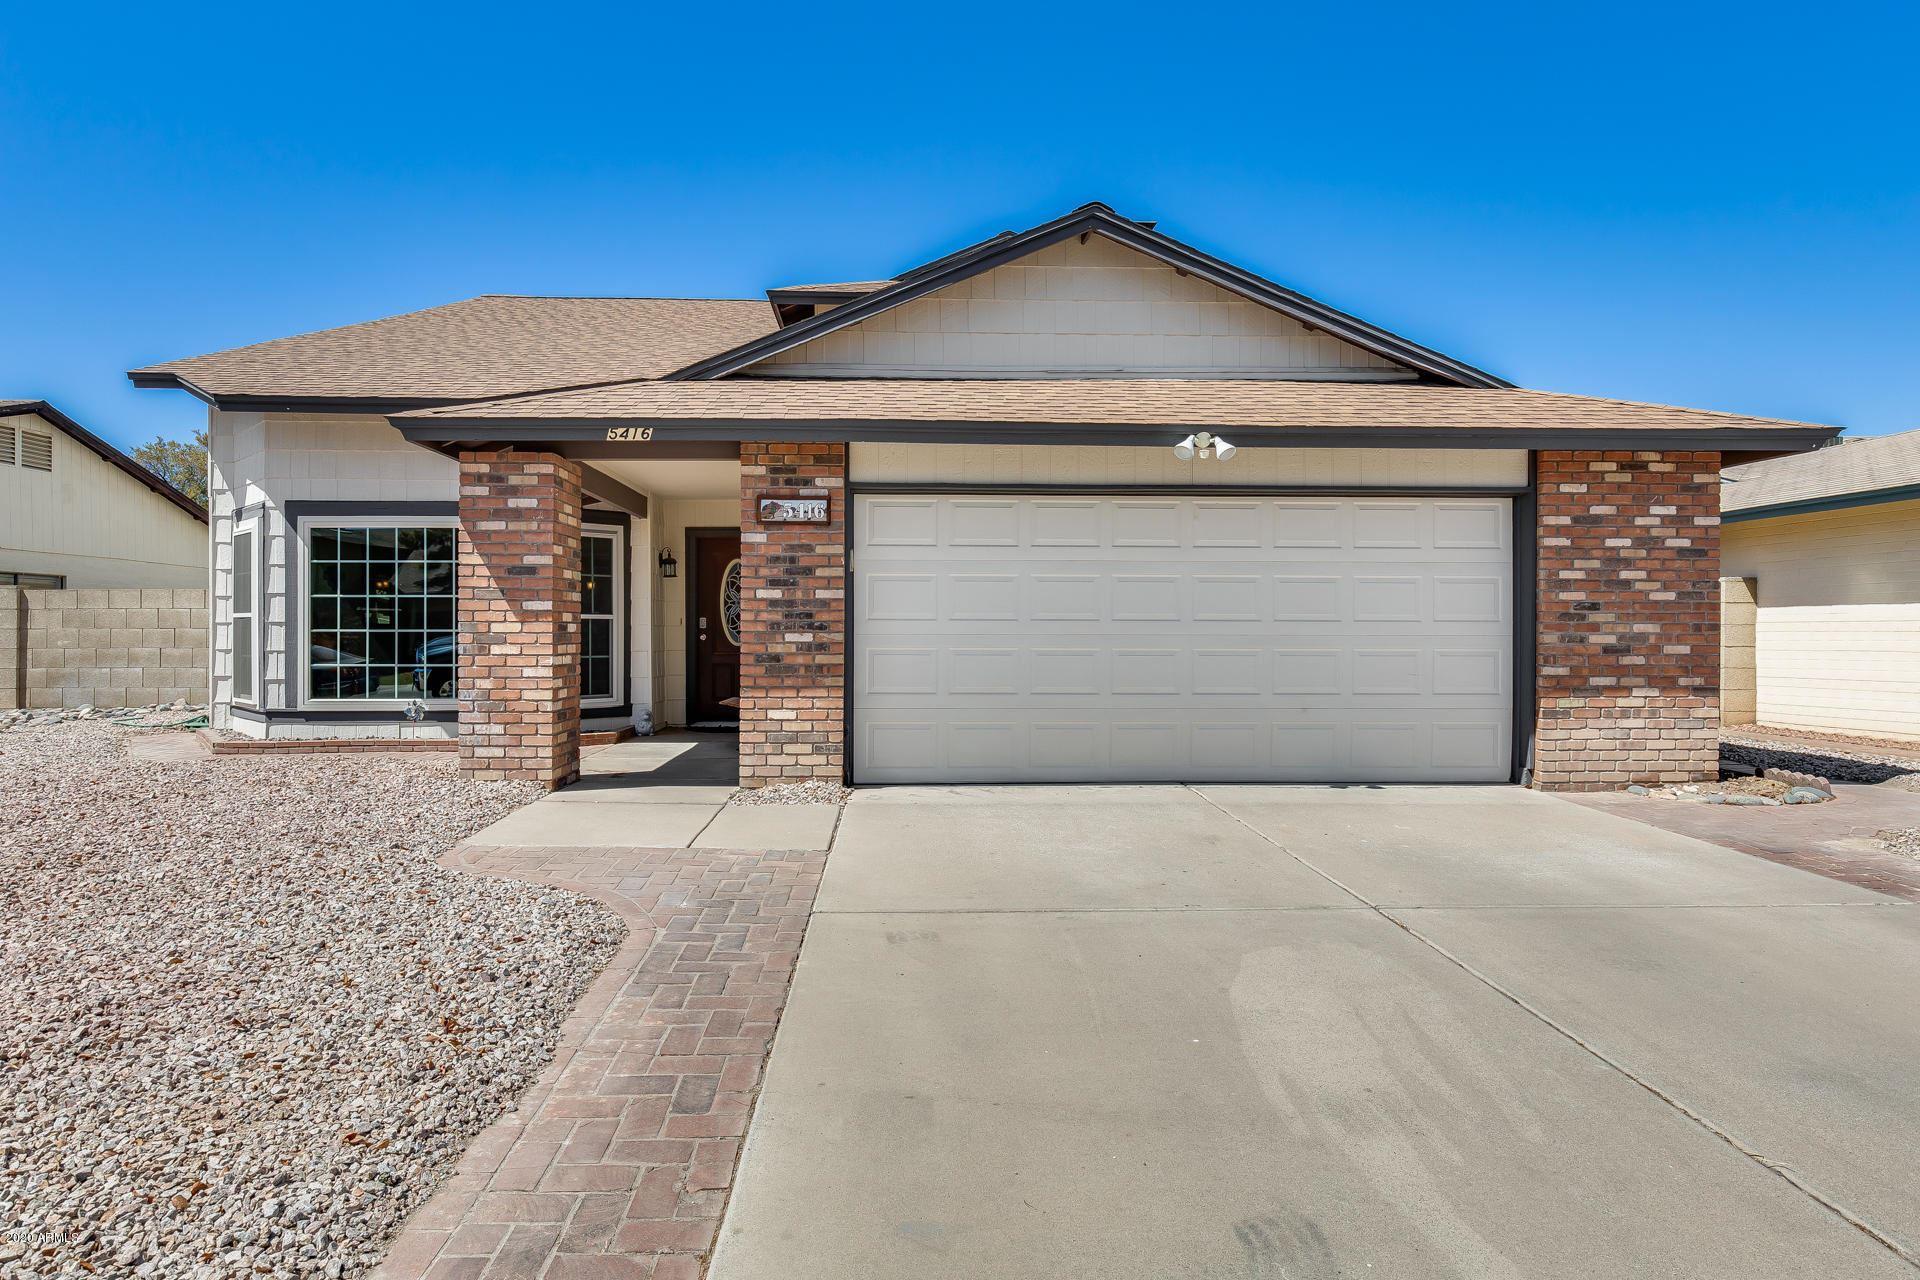 5416 W DESERT HILLS Drive, Glendale, AZ 85304 - #: 6114519